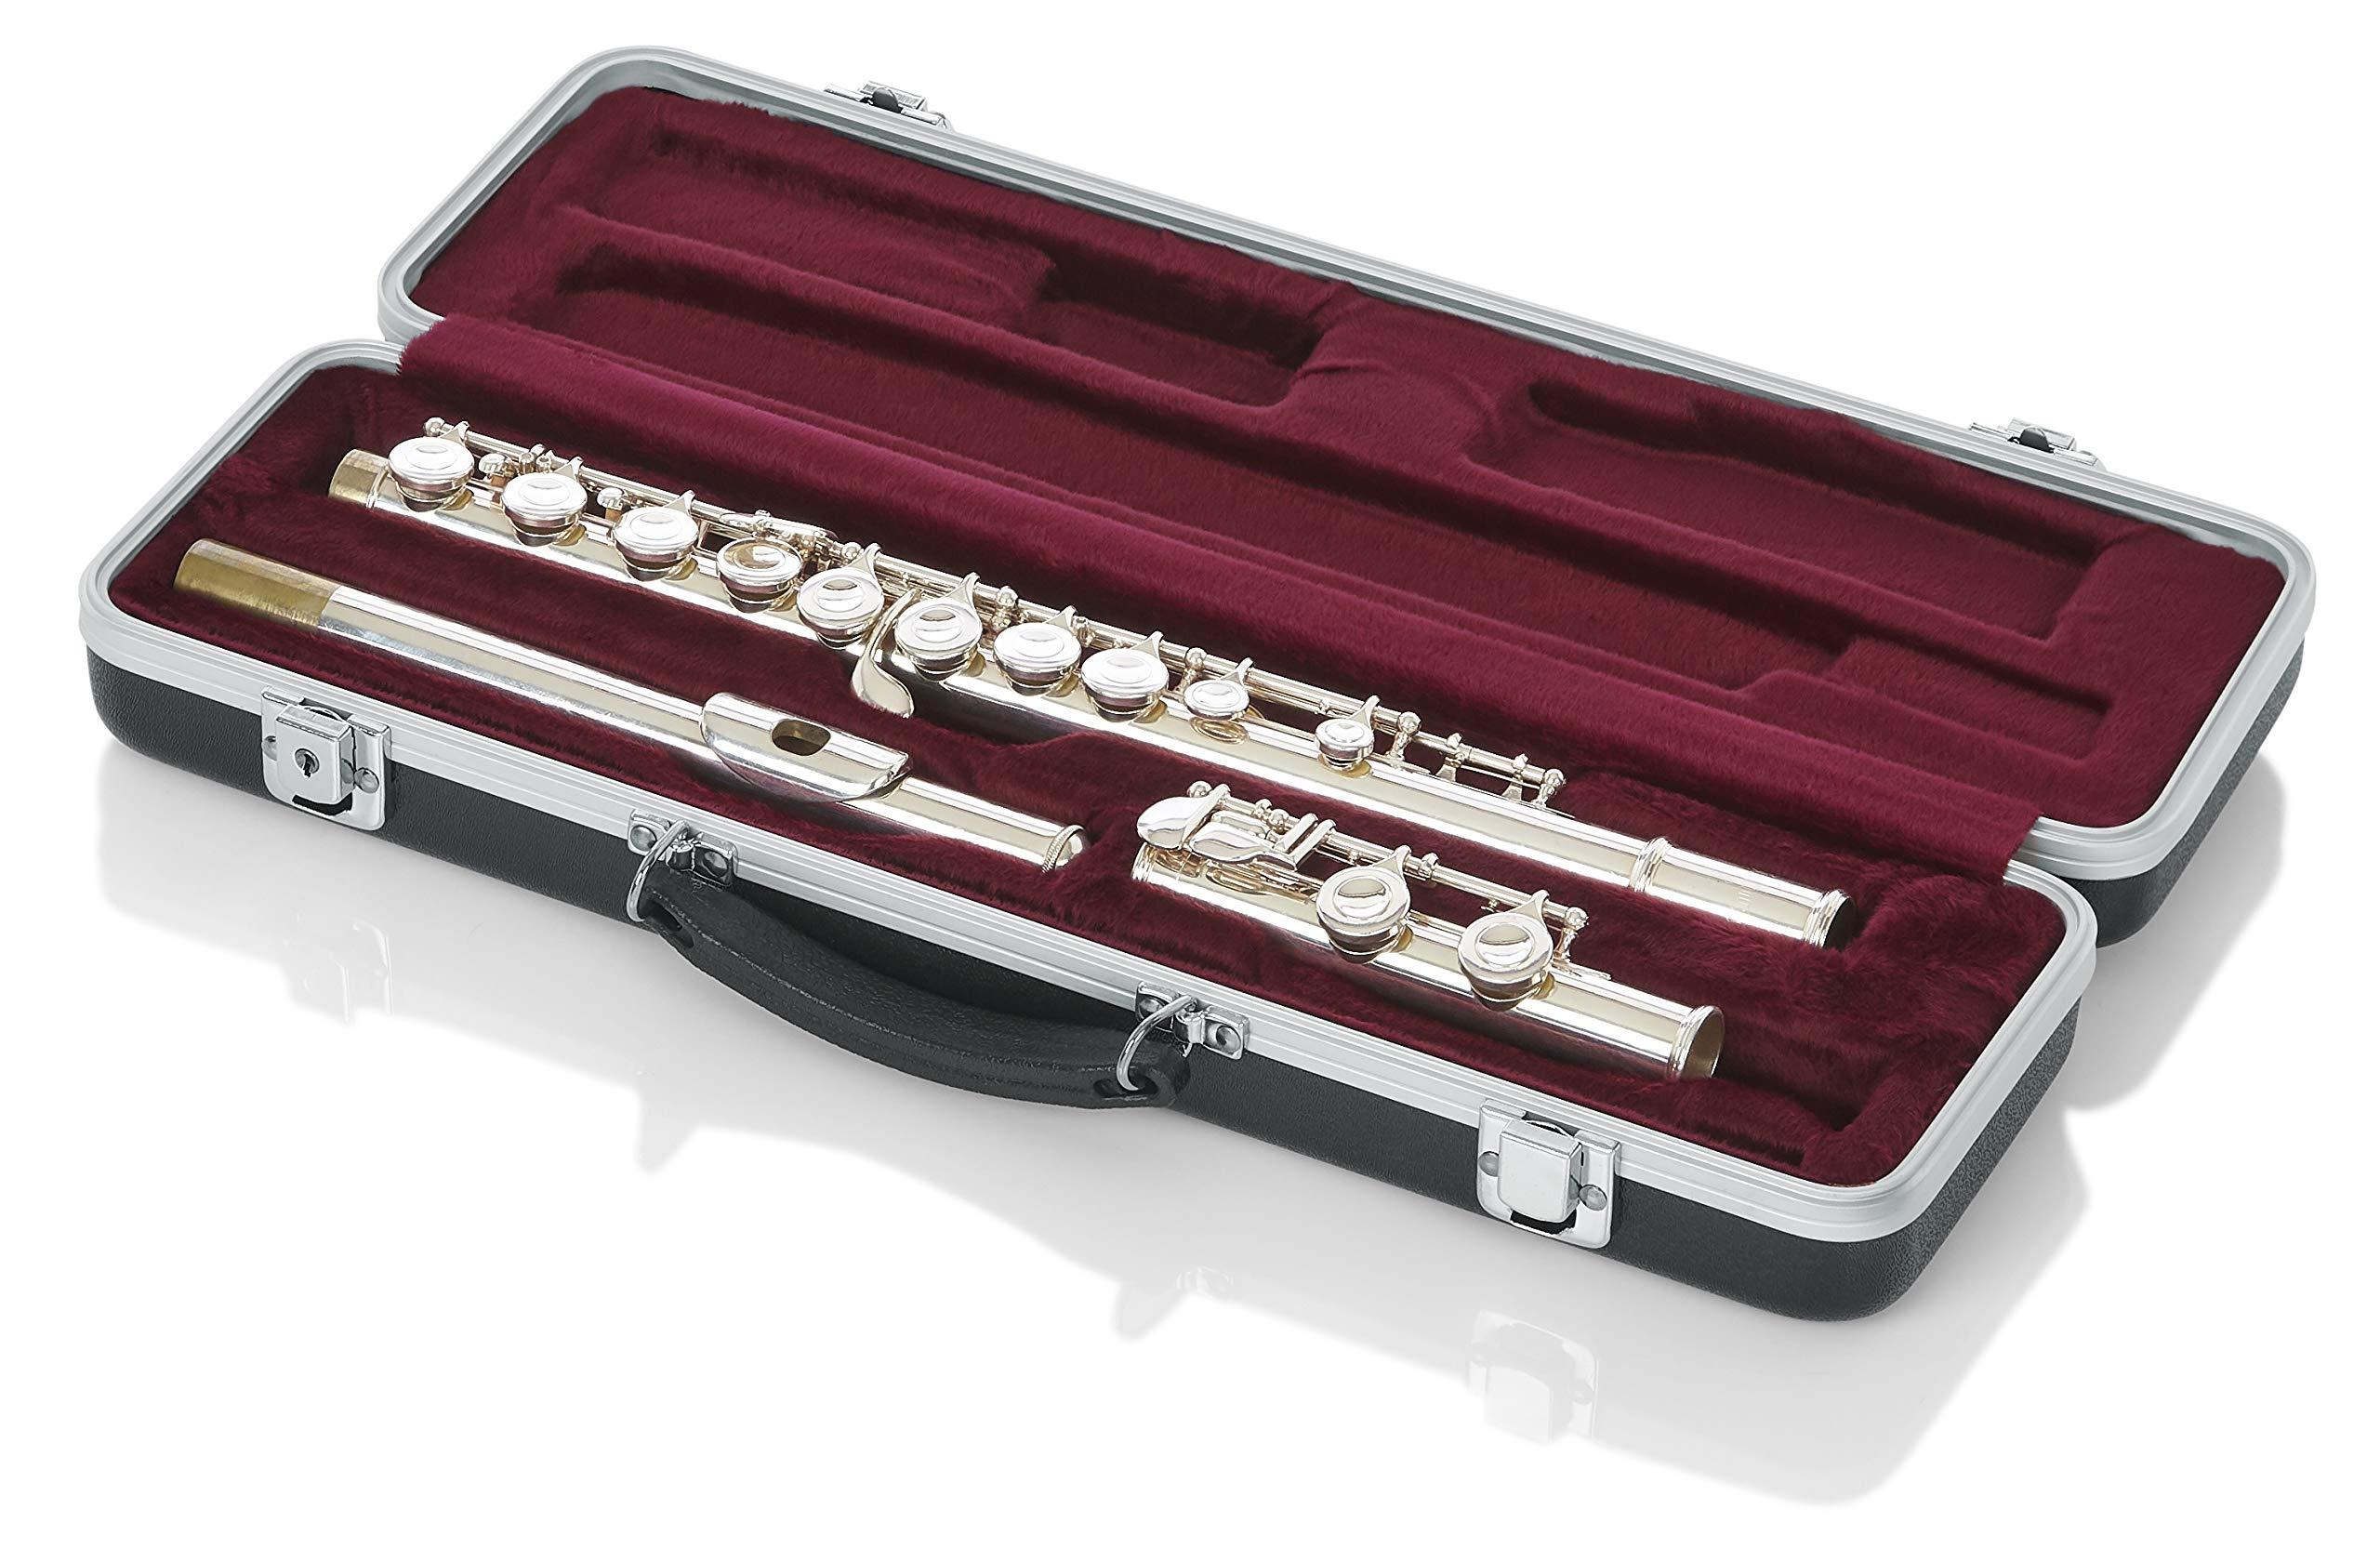 GATOR GC-FLUTE-B/C - Estuche para flauta travesera (interior moldeado): Amazon.es: Instrumentos musicales